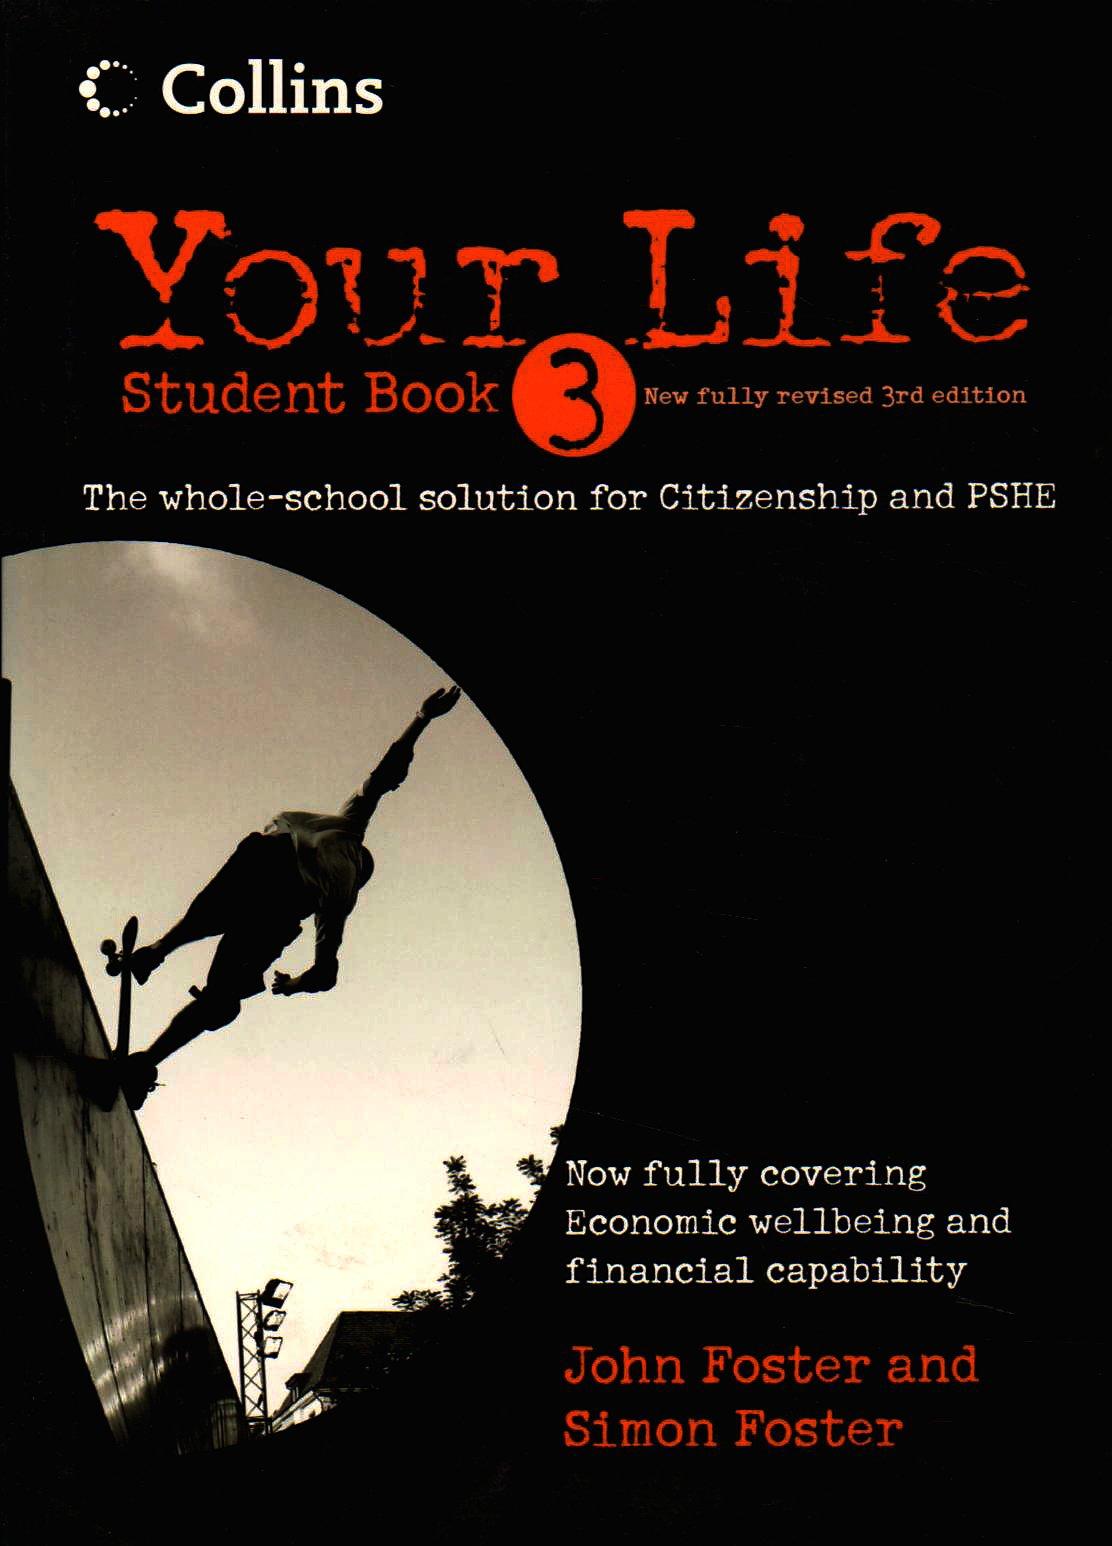 Poster design john foster - Your Life Student Book 3 Amazon Co Uk John Foster Simon Foster 9780007312474 Books